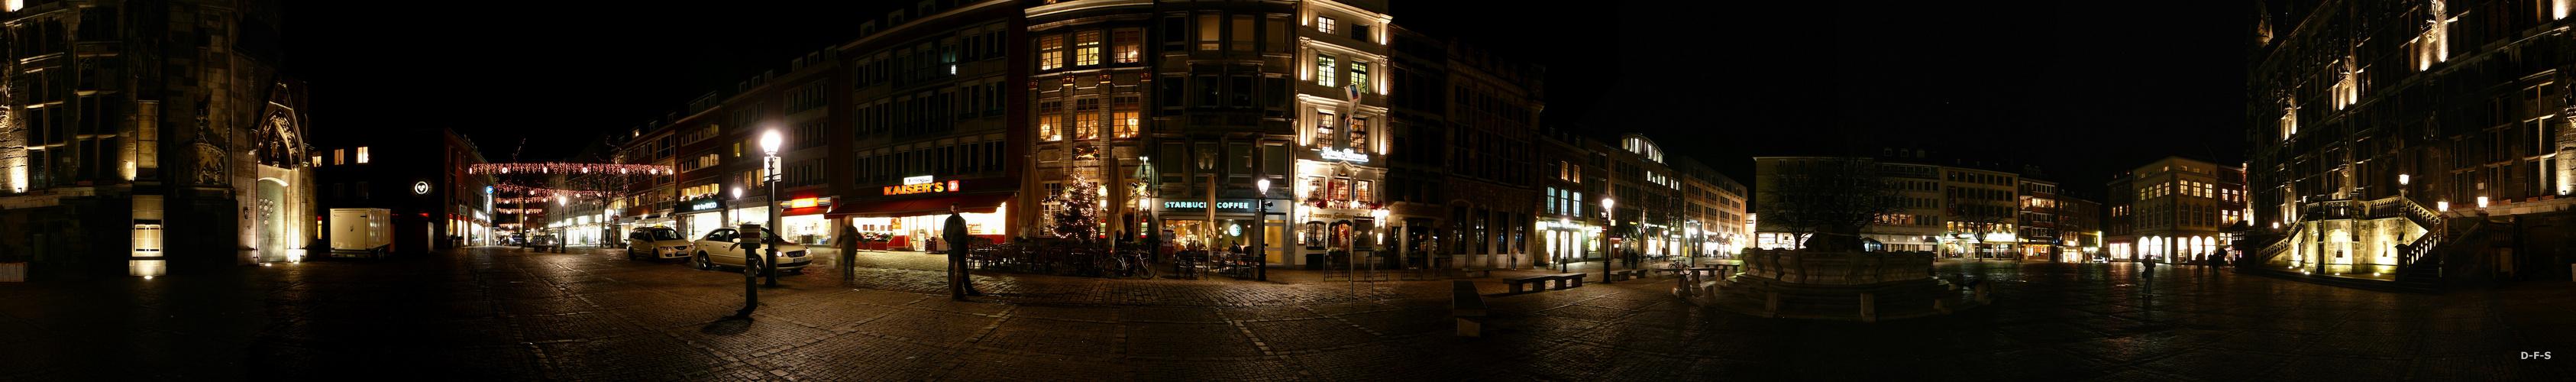 Rathausplatz Aachen bei Nacht